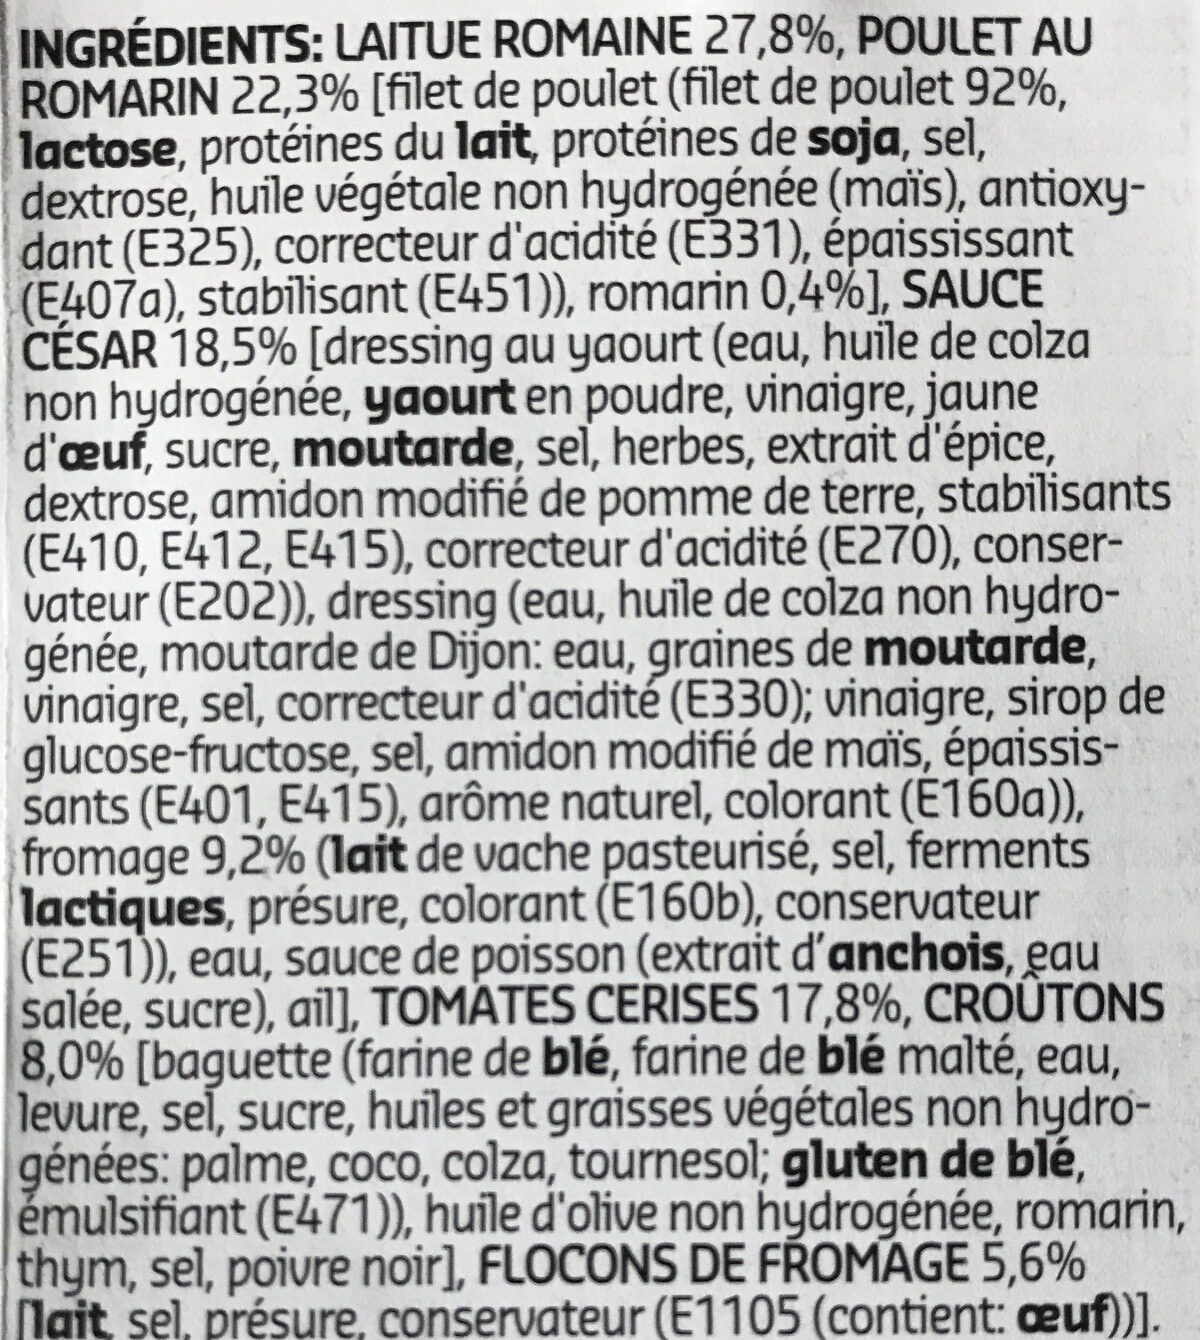 Salade César - Ingrédients